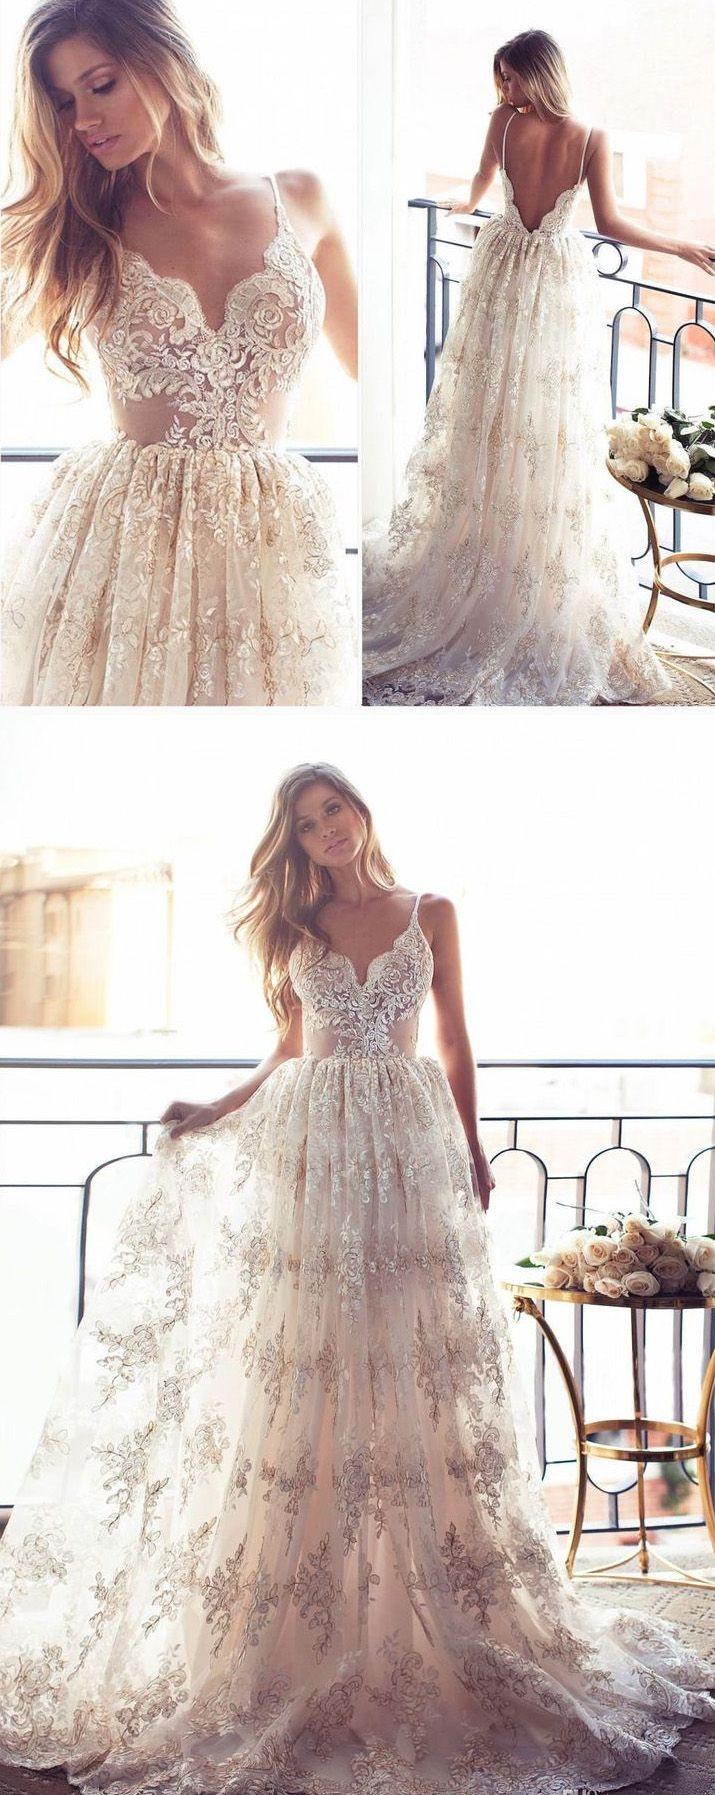 Champagne evening dresses long prom dresses prom dresses lace